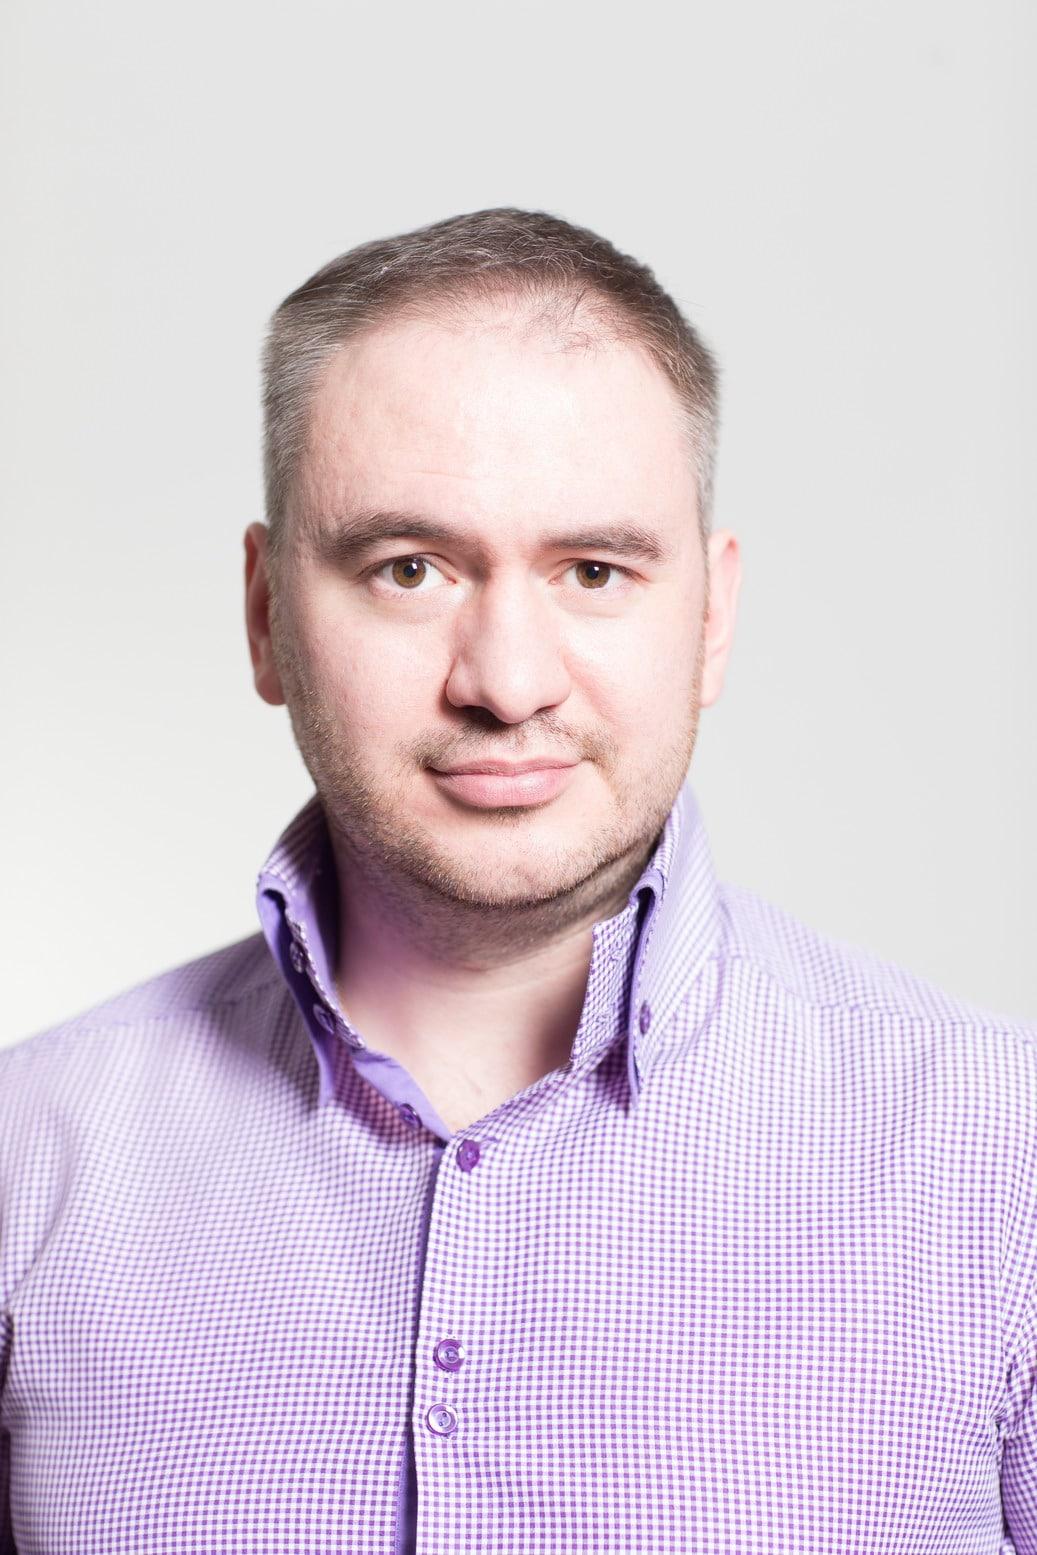 Aleksandr Zlatopolskiy Swedish Actor, Writer, Producer